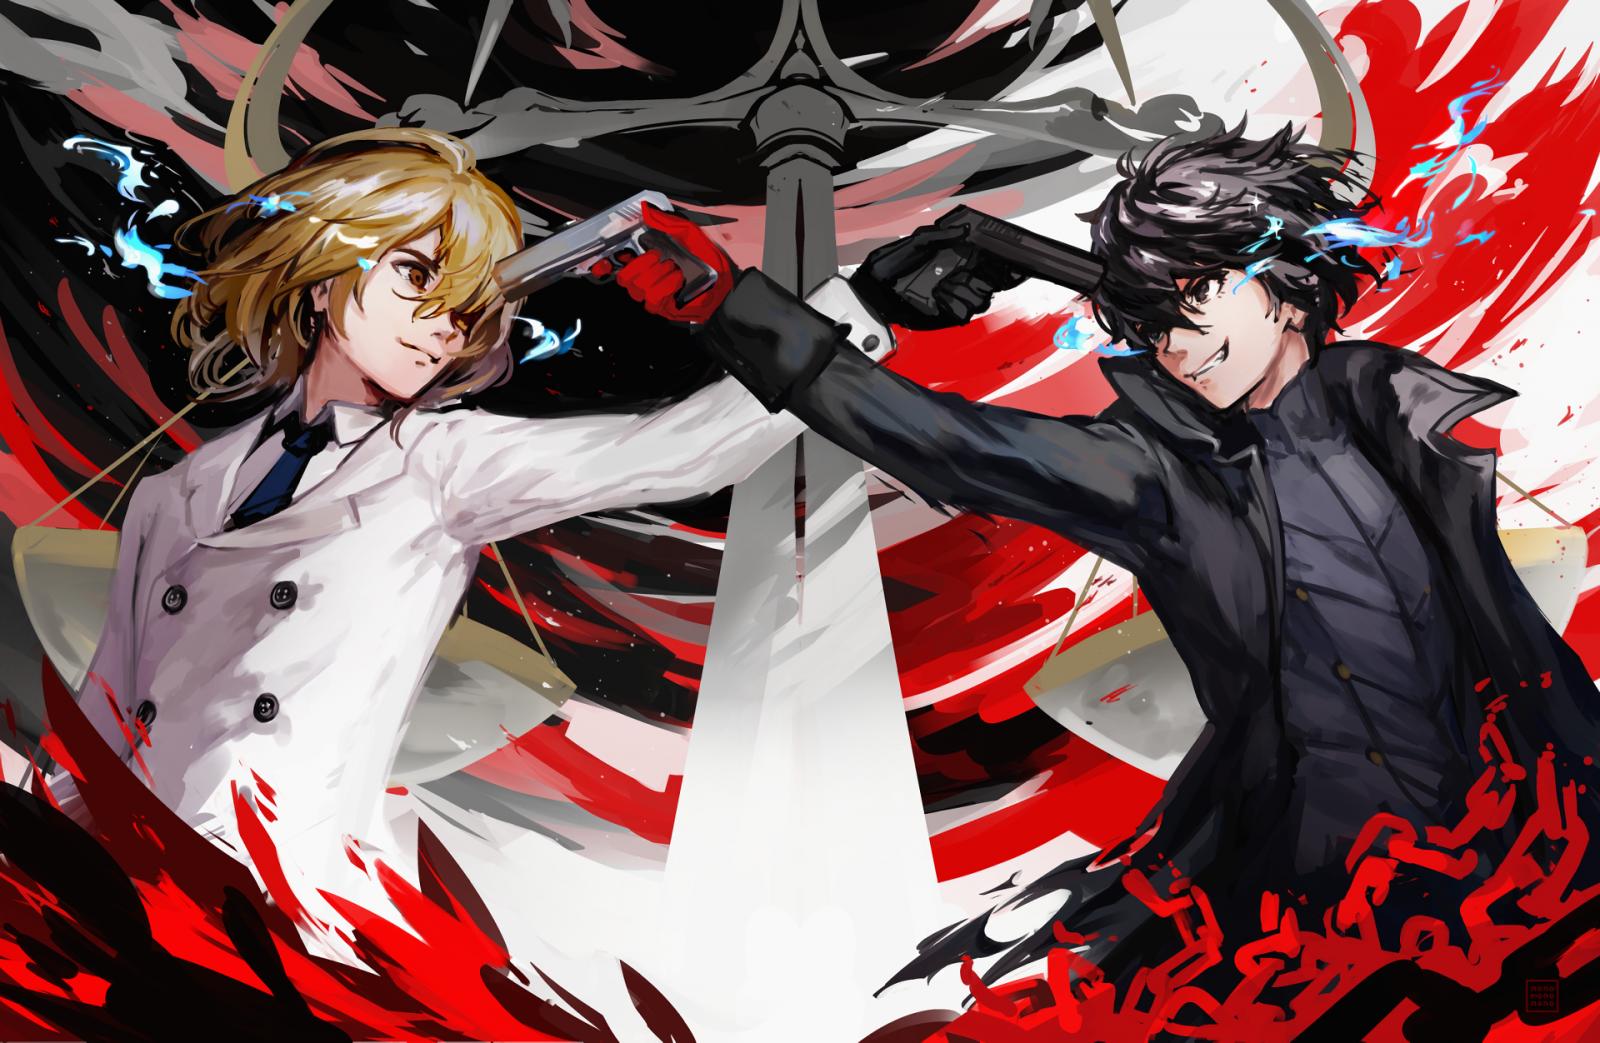 Wallpaper : Persona 5, Akira Kurusu, Persona series ...